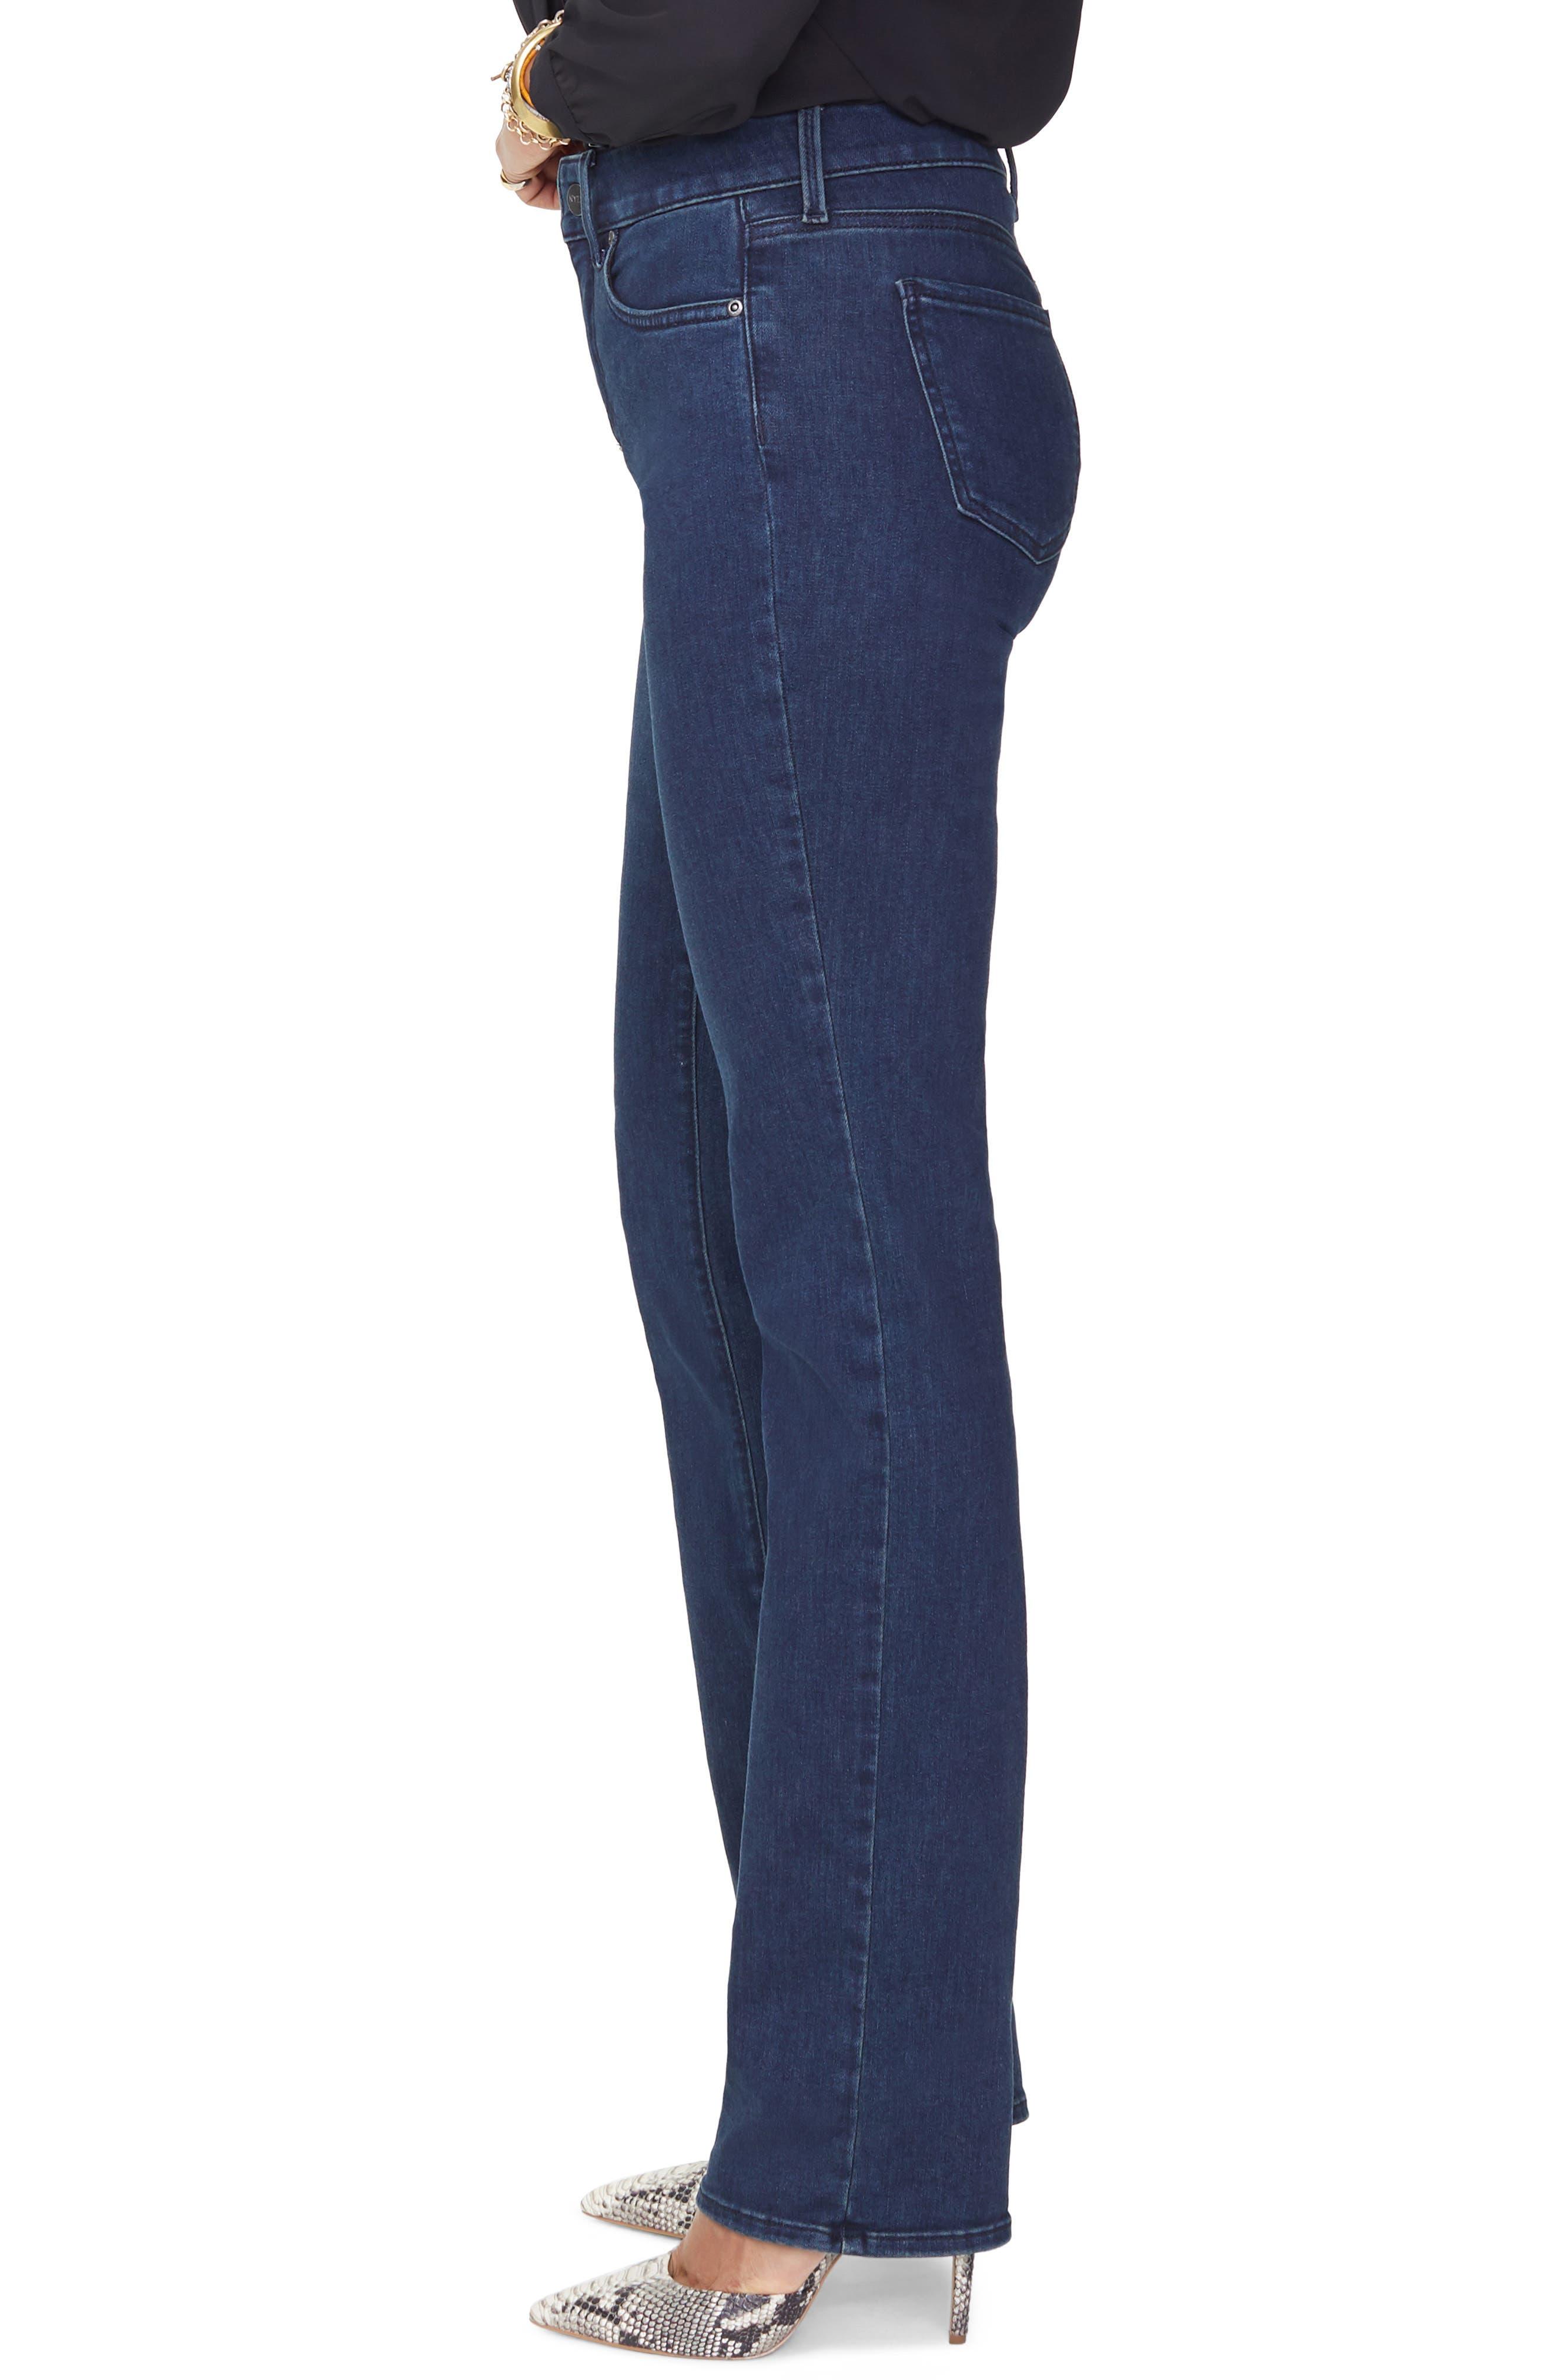 NYDJ, Marilyn Stretch Straight Leg Jeans, Alternate thumbnail 4, color, 405